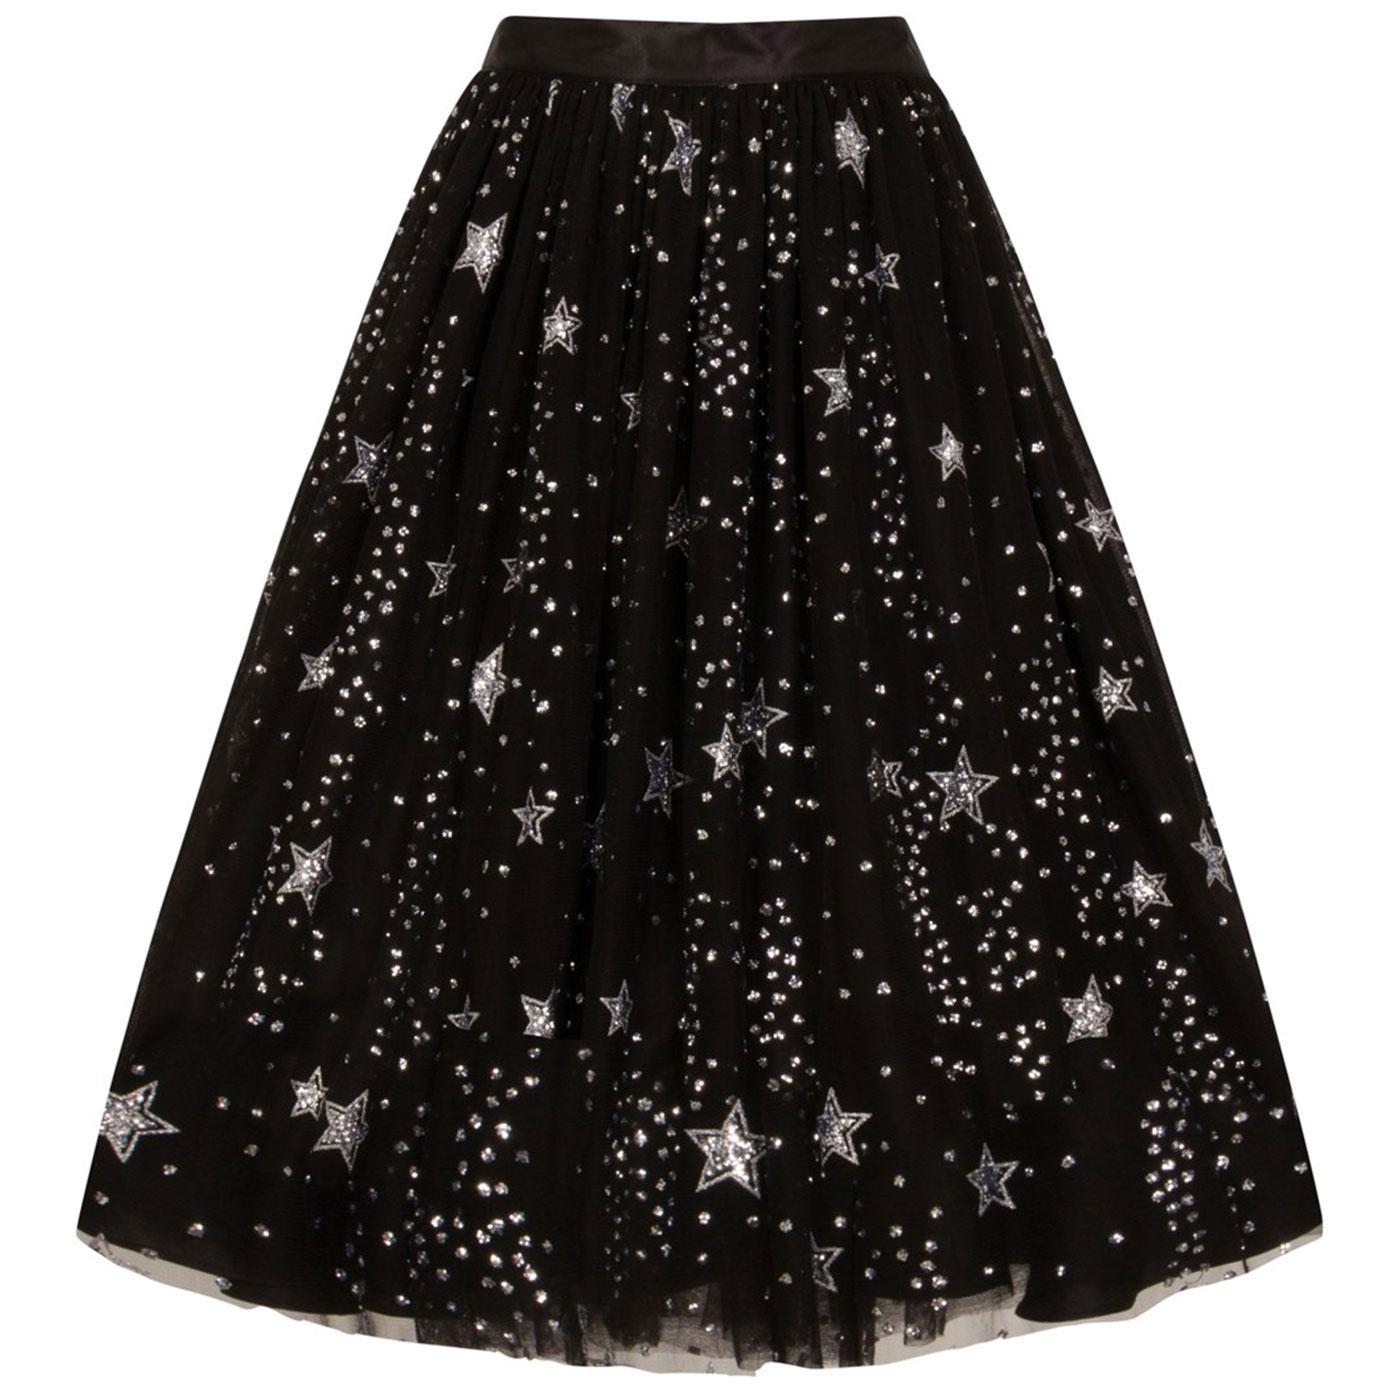 Cosmic Love HELL BUNNY Vintage Stars Tulle Skirt